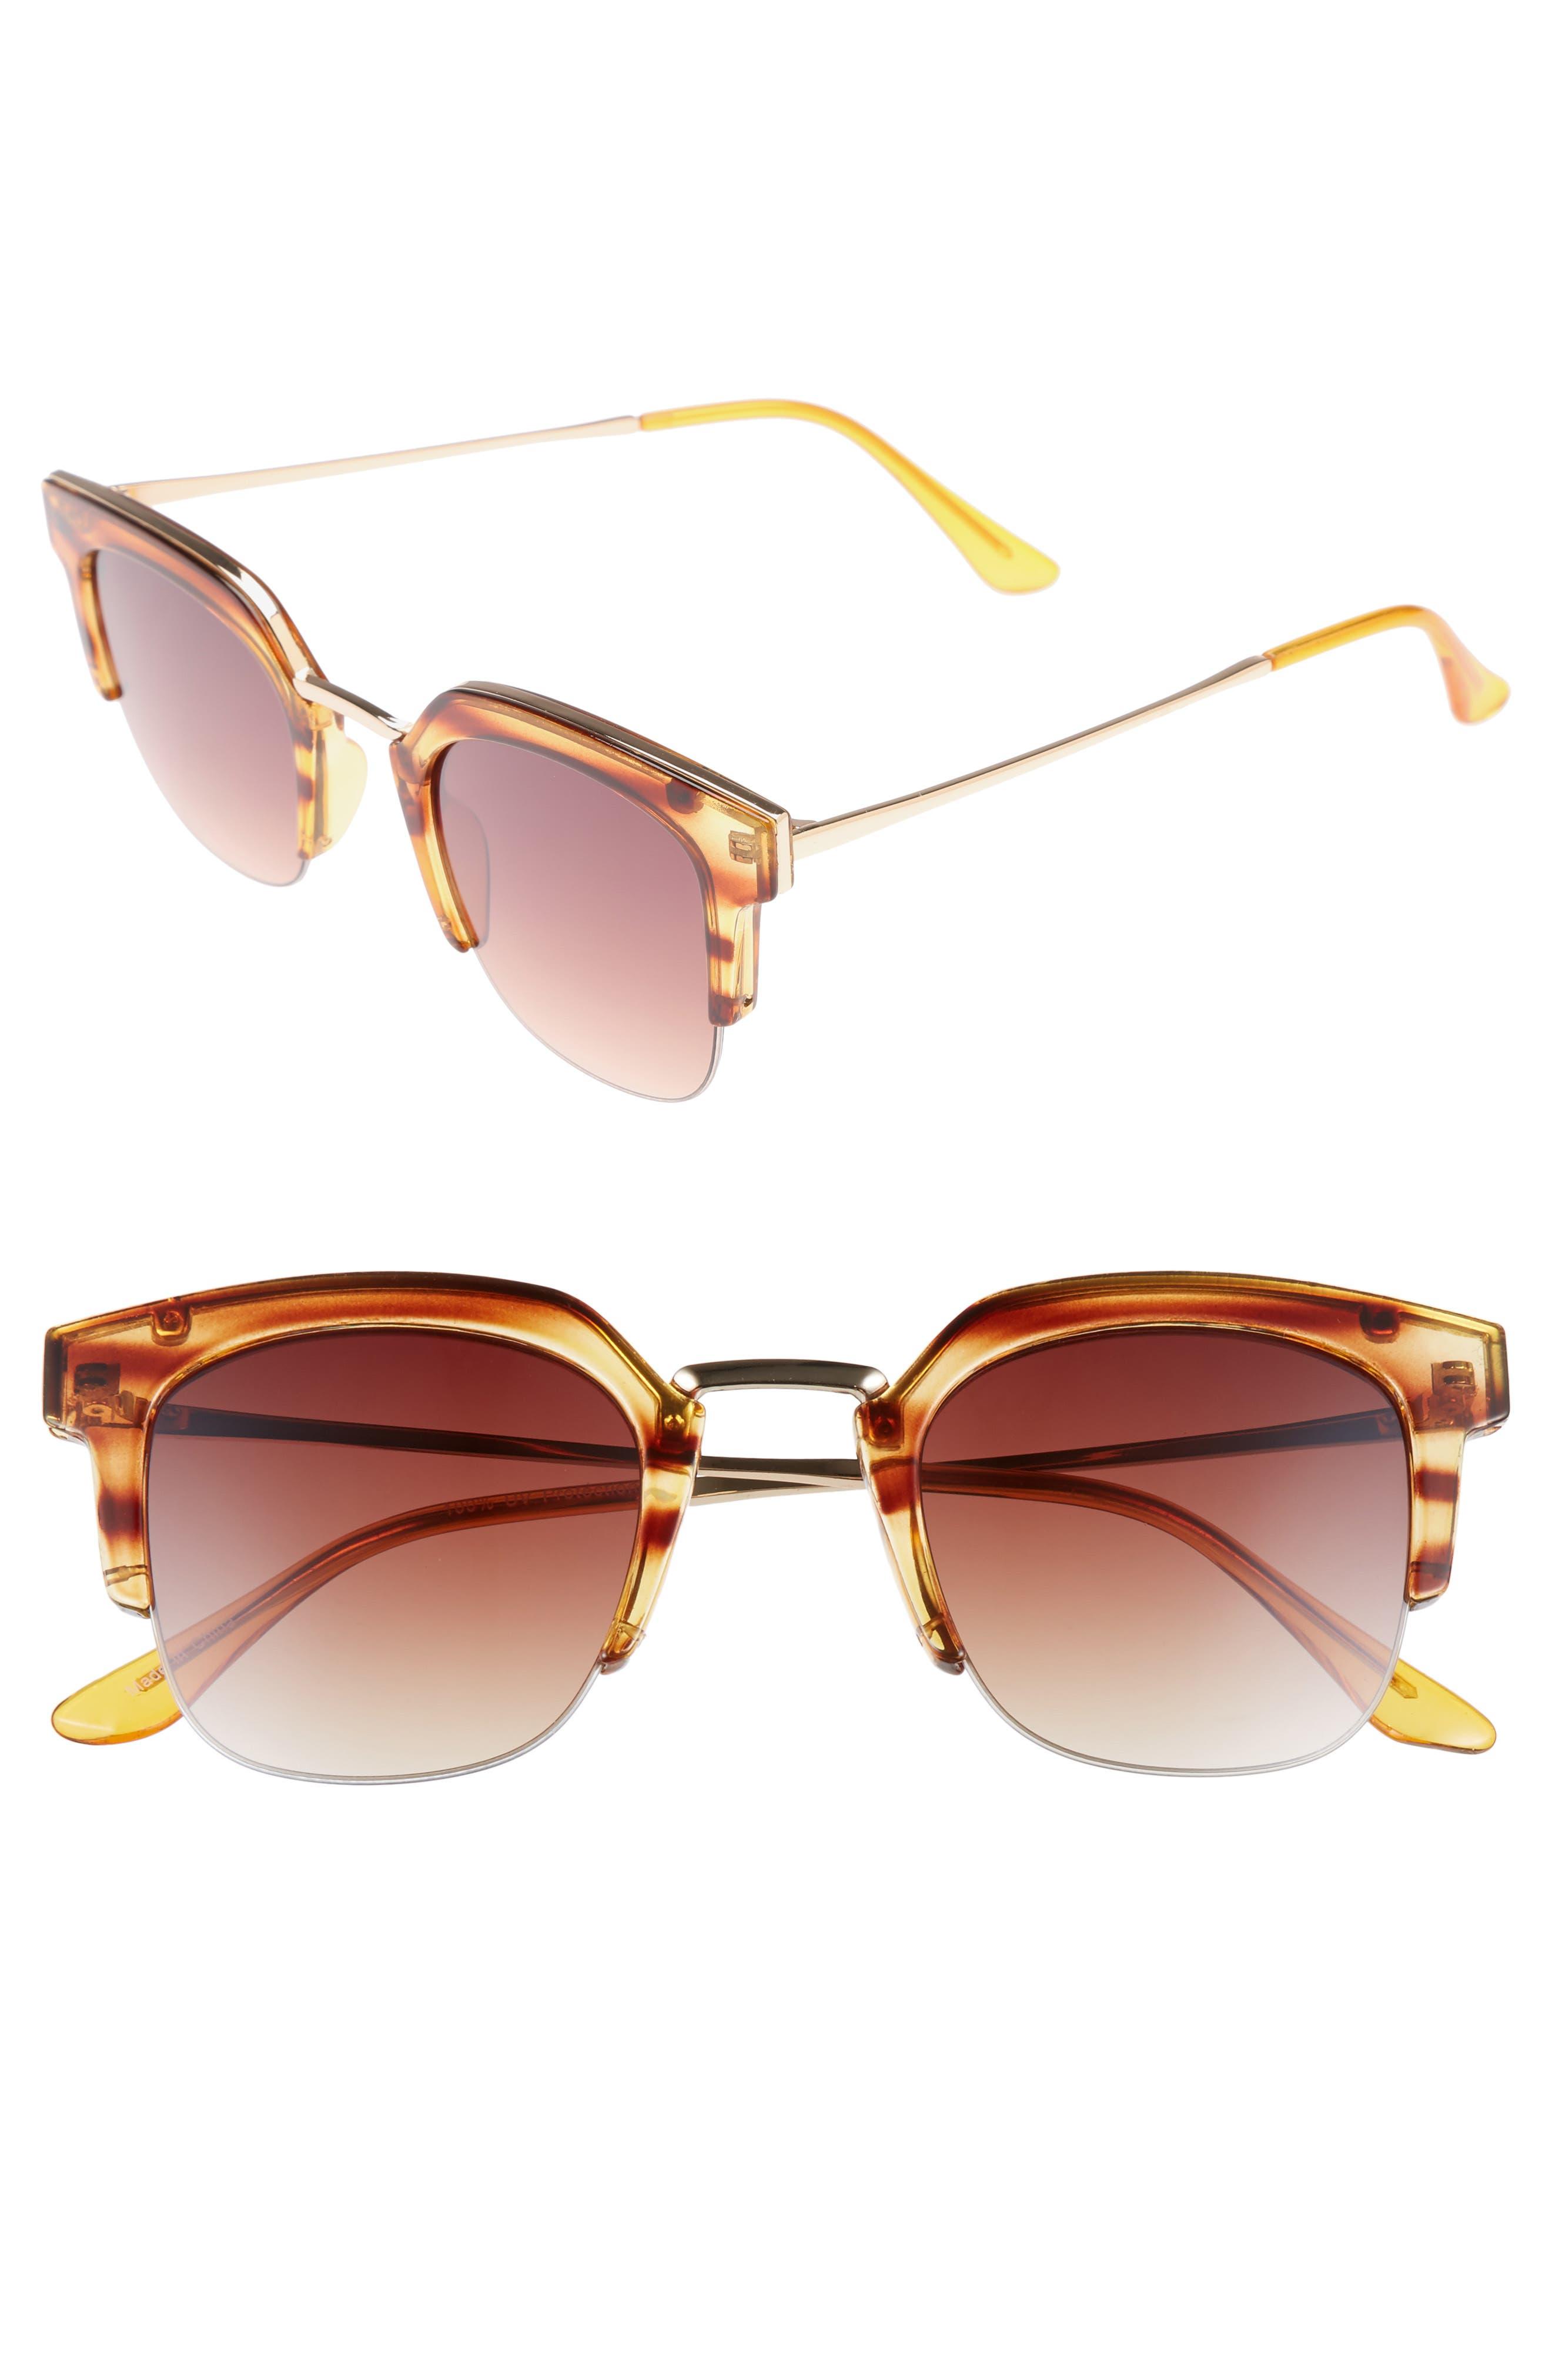 47mm Retro Sunglasses,                             Main thumbnail 1, color,                             200